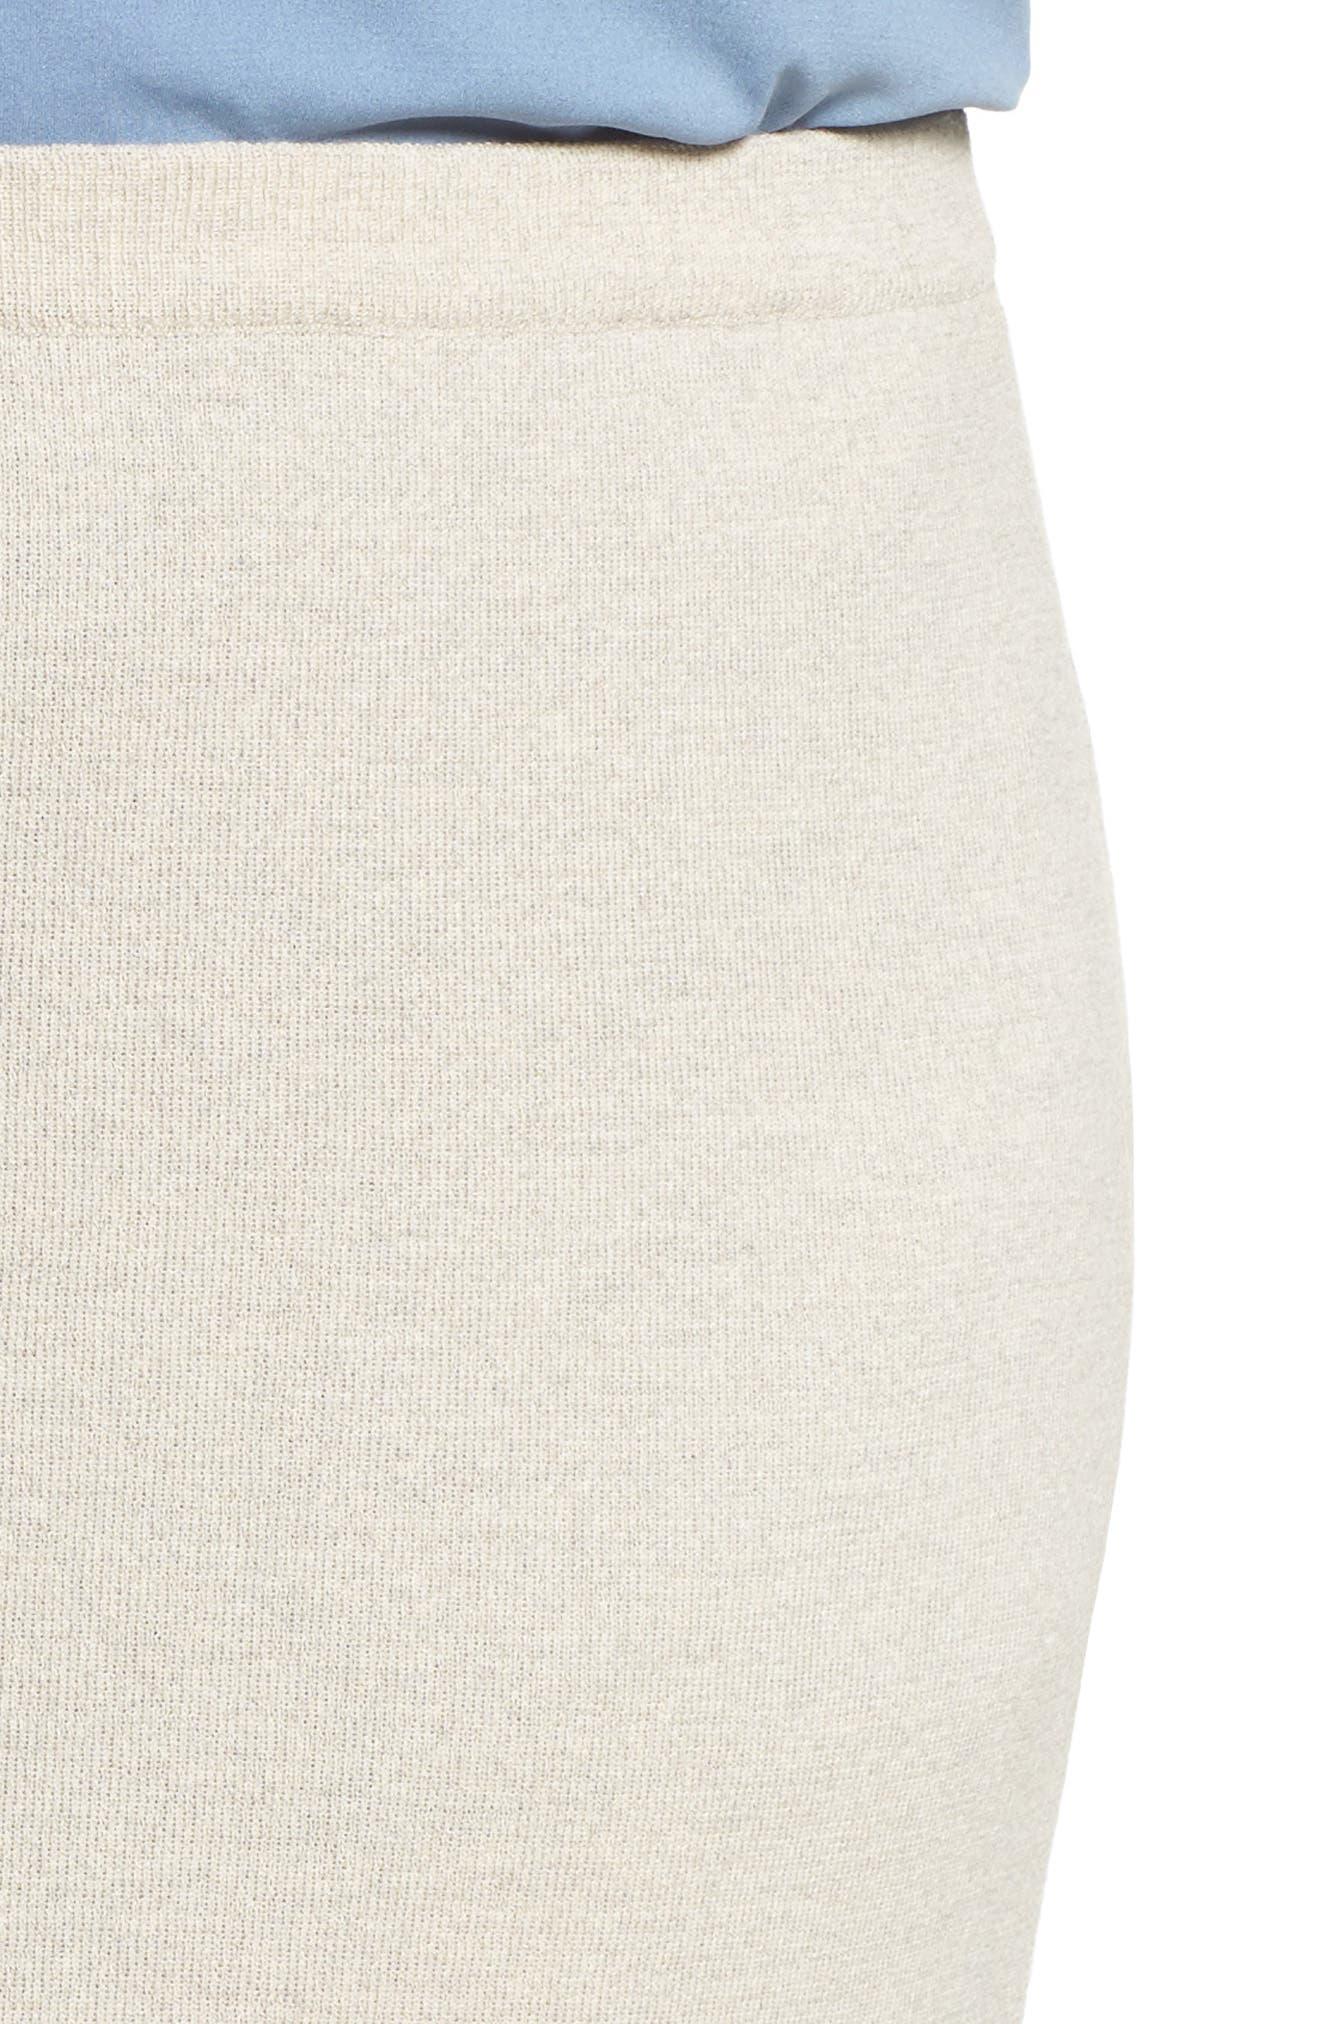 Alternate Image 4  - Eileen Fisher Wool Knit Pencil Skirt (Plus Size)